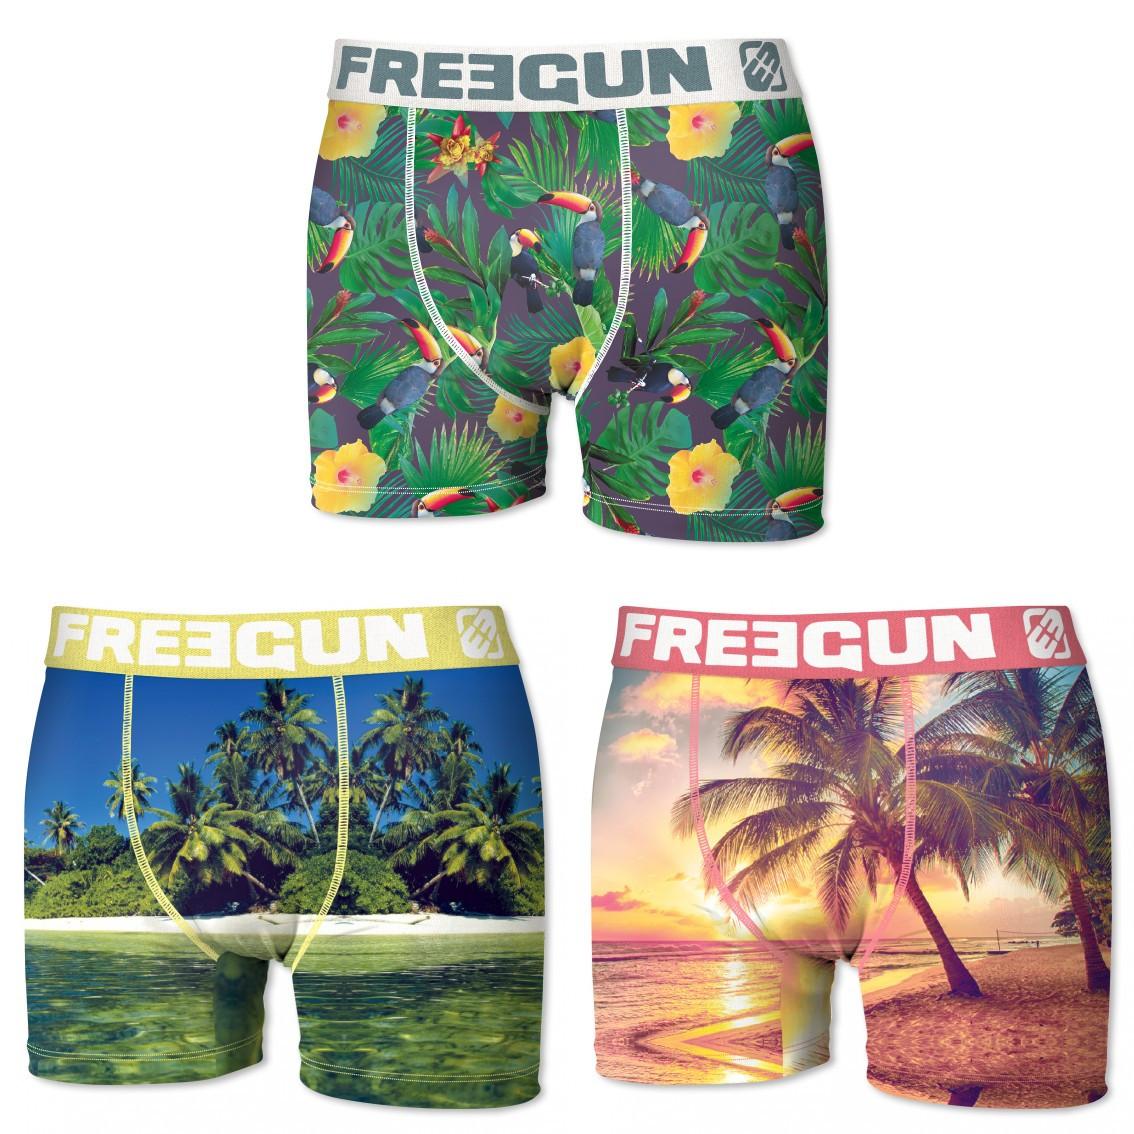 FREEGUN Boys Pants Pack of 3